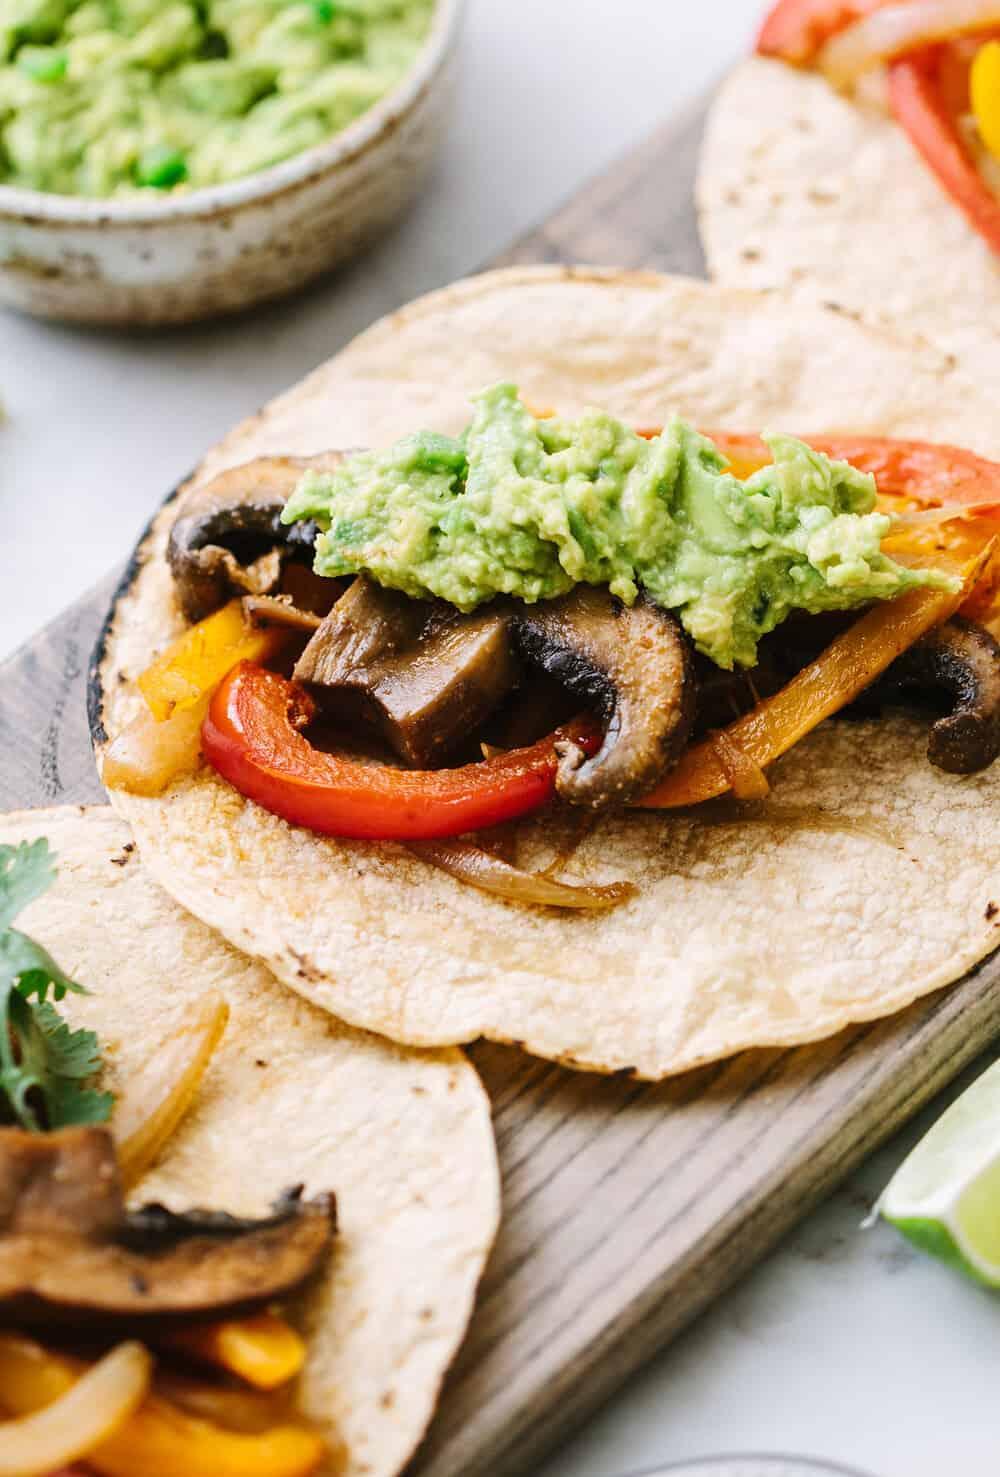 side angle view of easy portobello mushroom fajitas topped with jalapeno guacamole on corn tortillas.